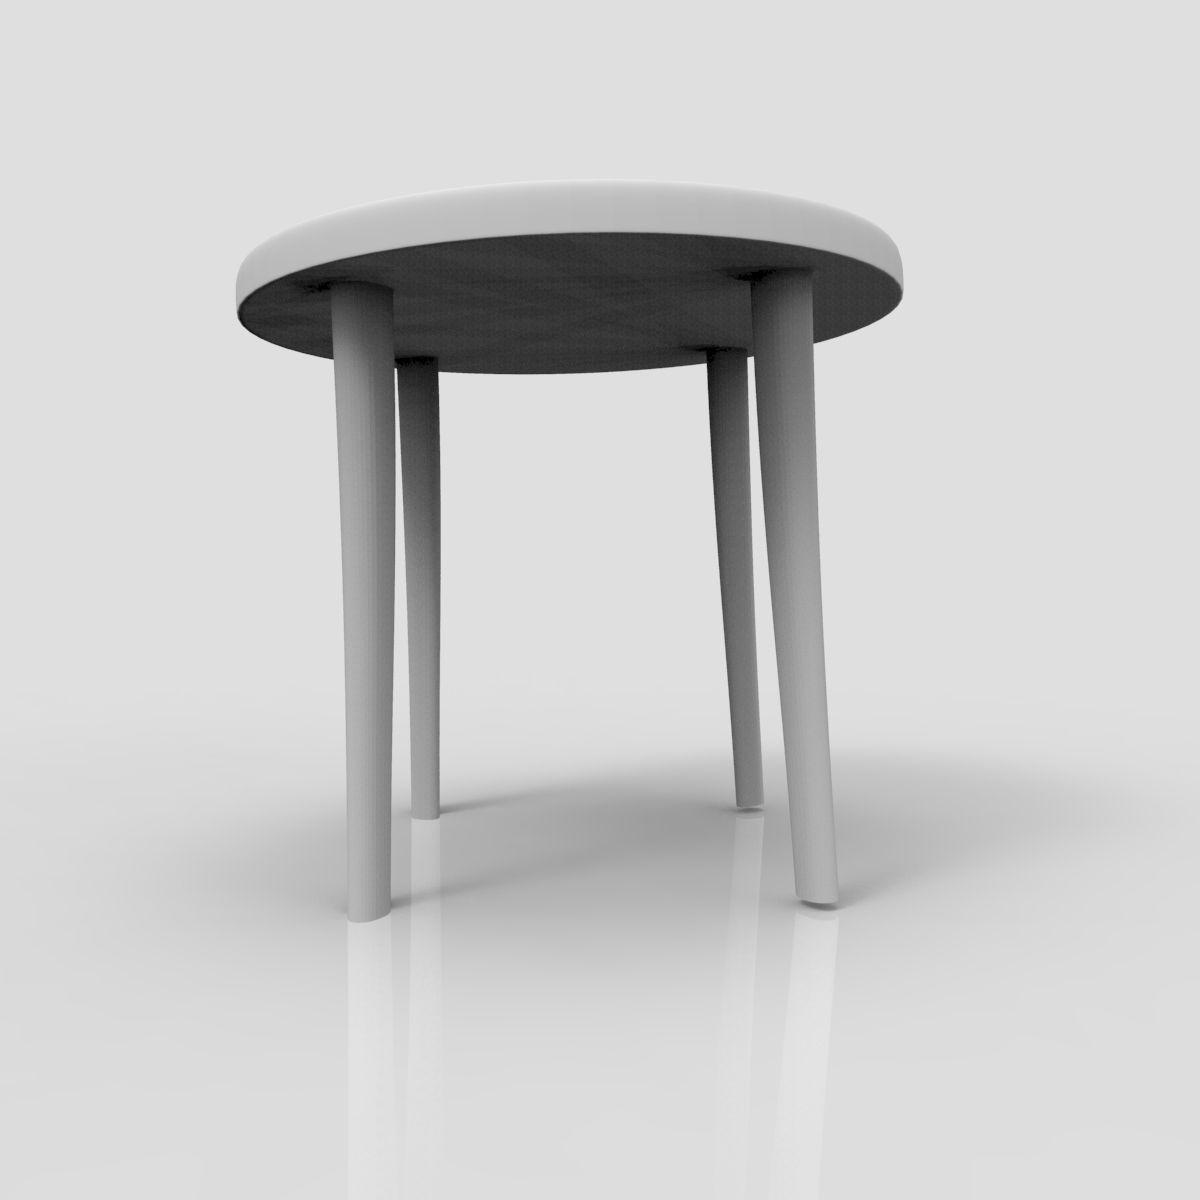 Miniature 3d Print Mini Coffee Table 02 Free 3d Model 3d Printable Stl